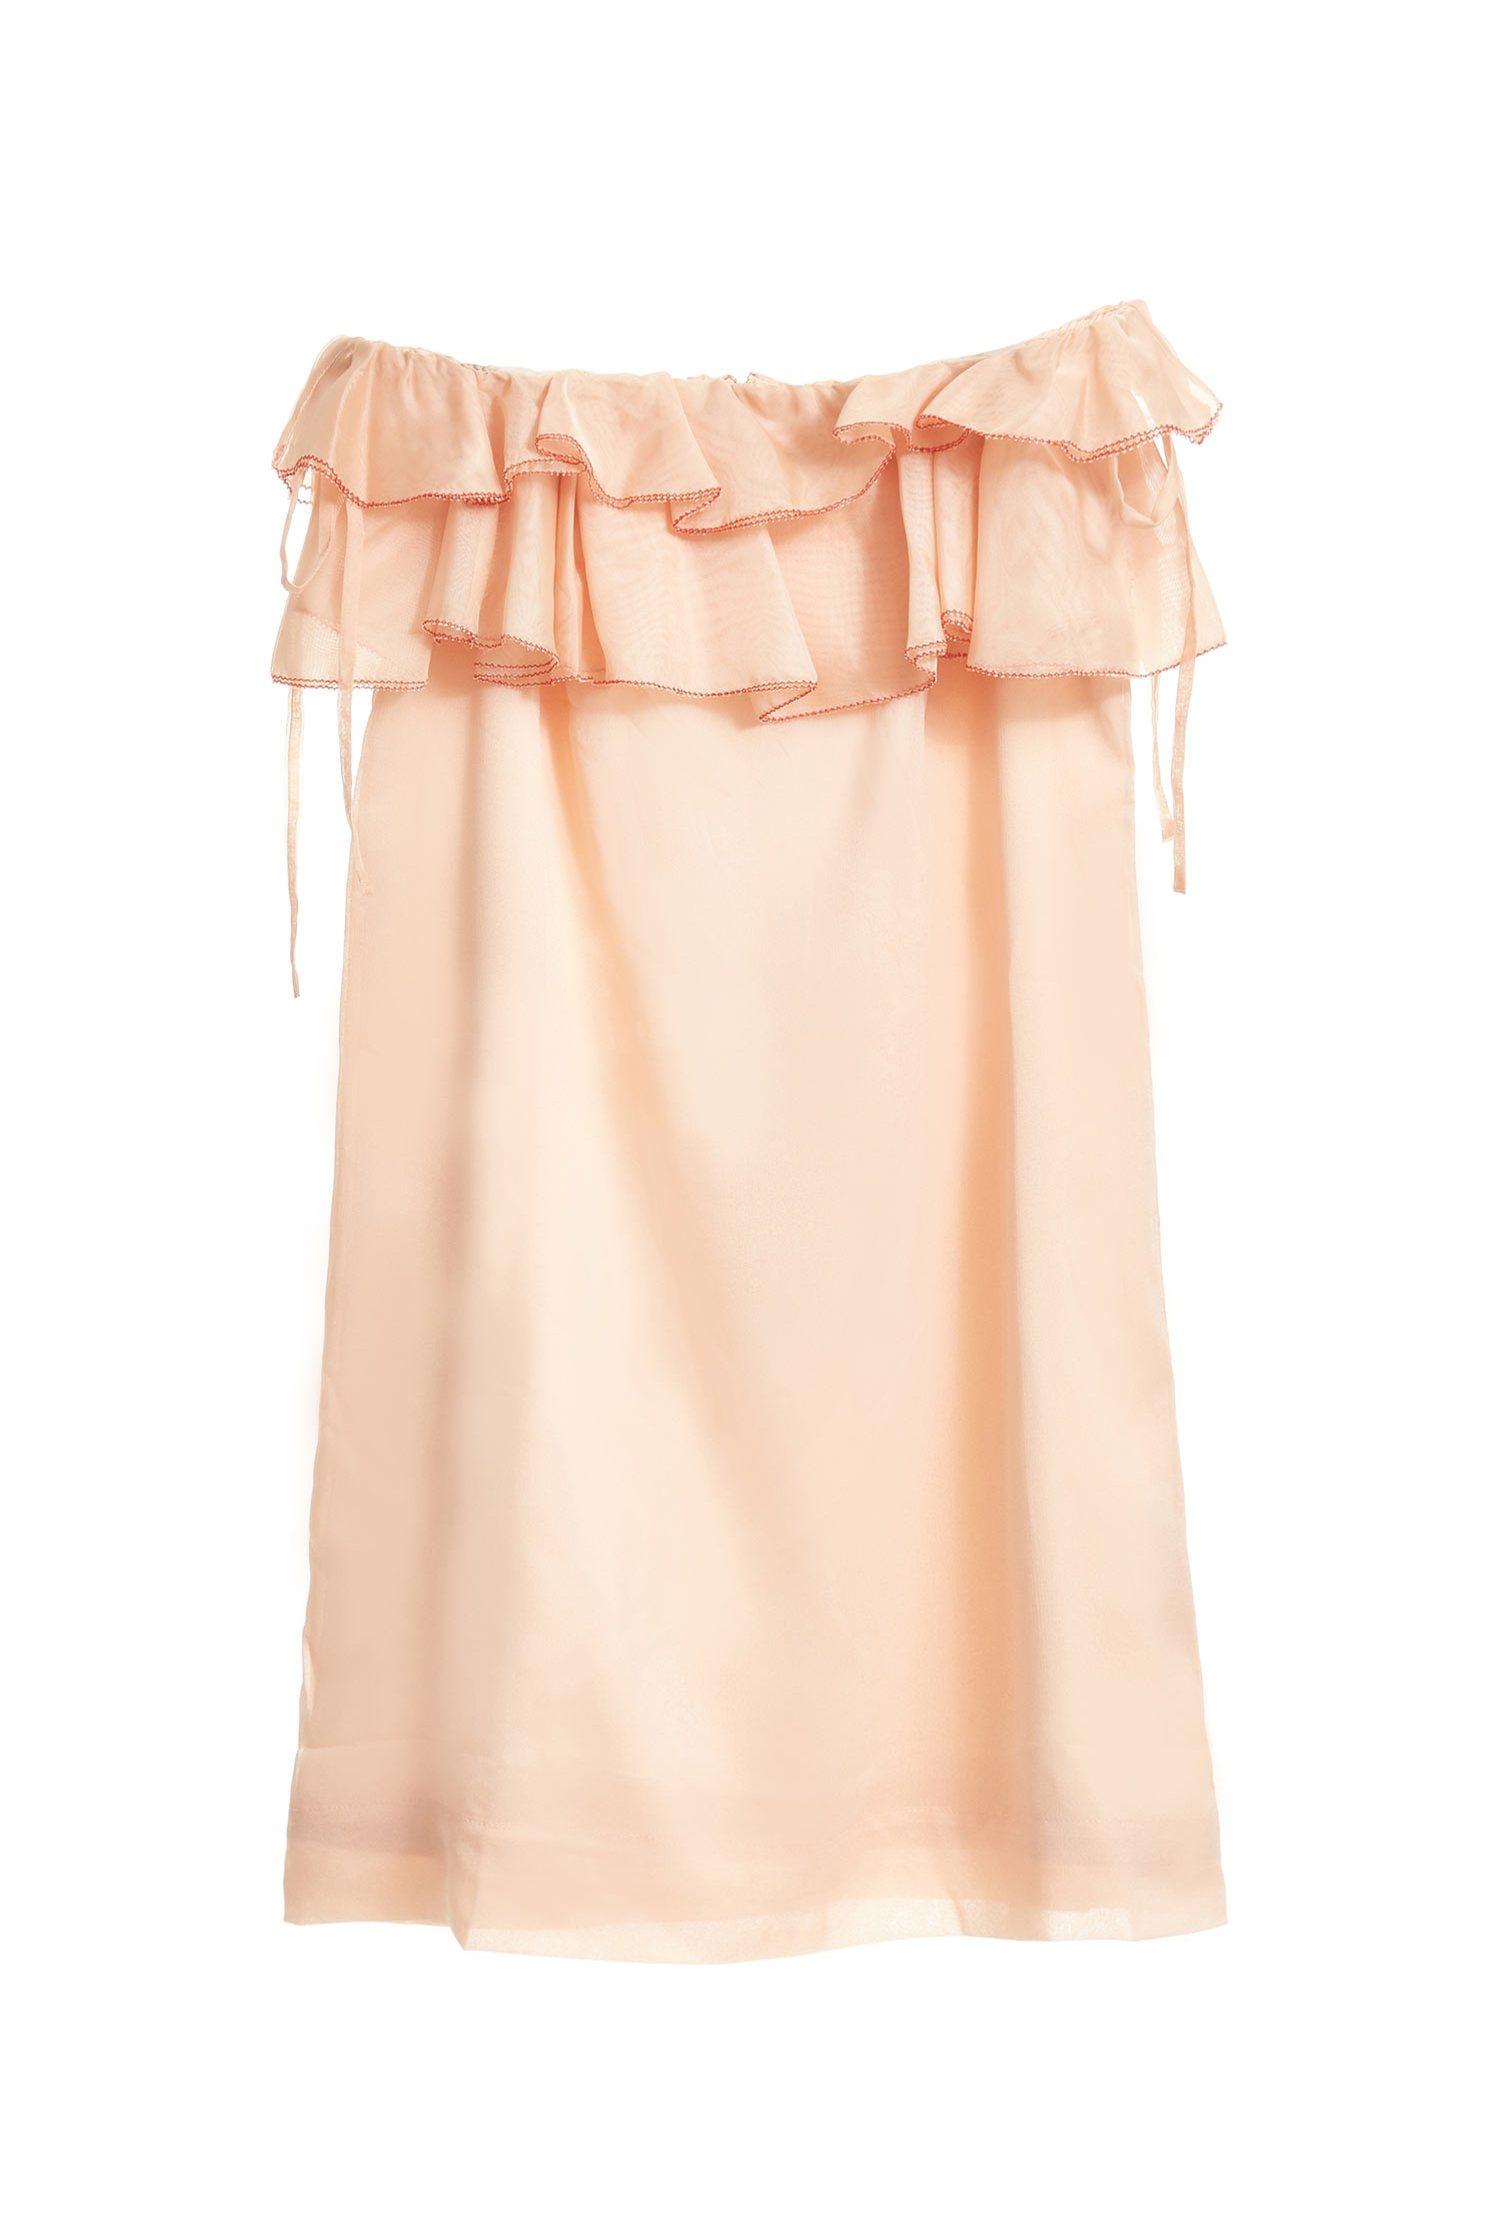 Off-the-shoulder gorgeous dress